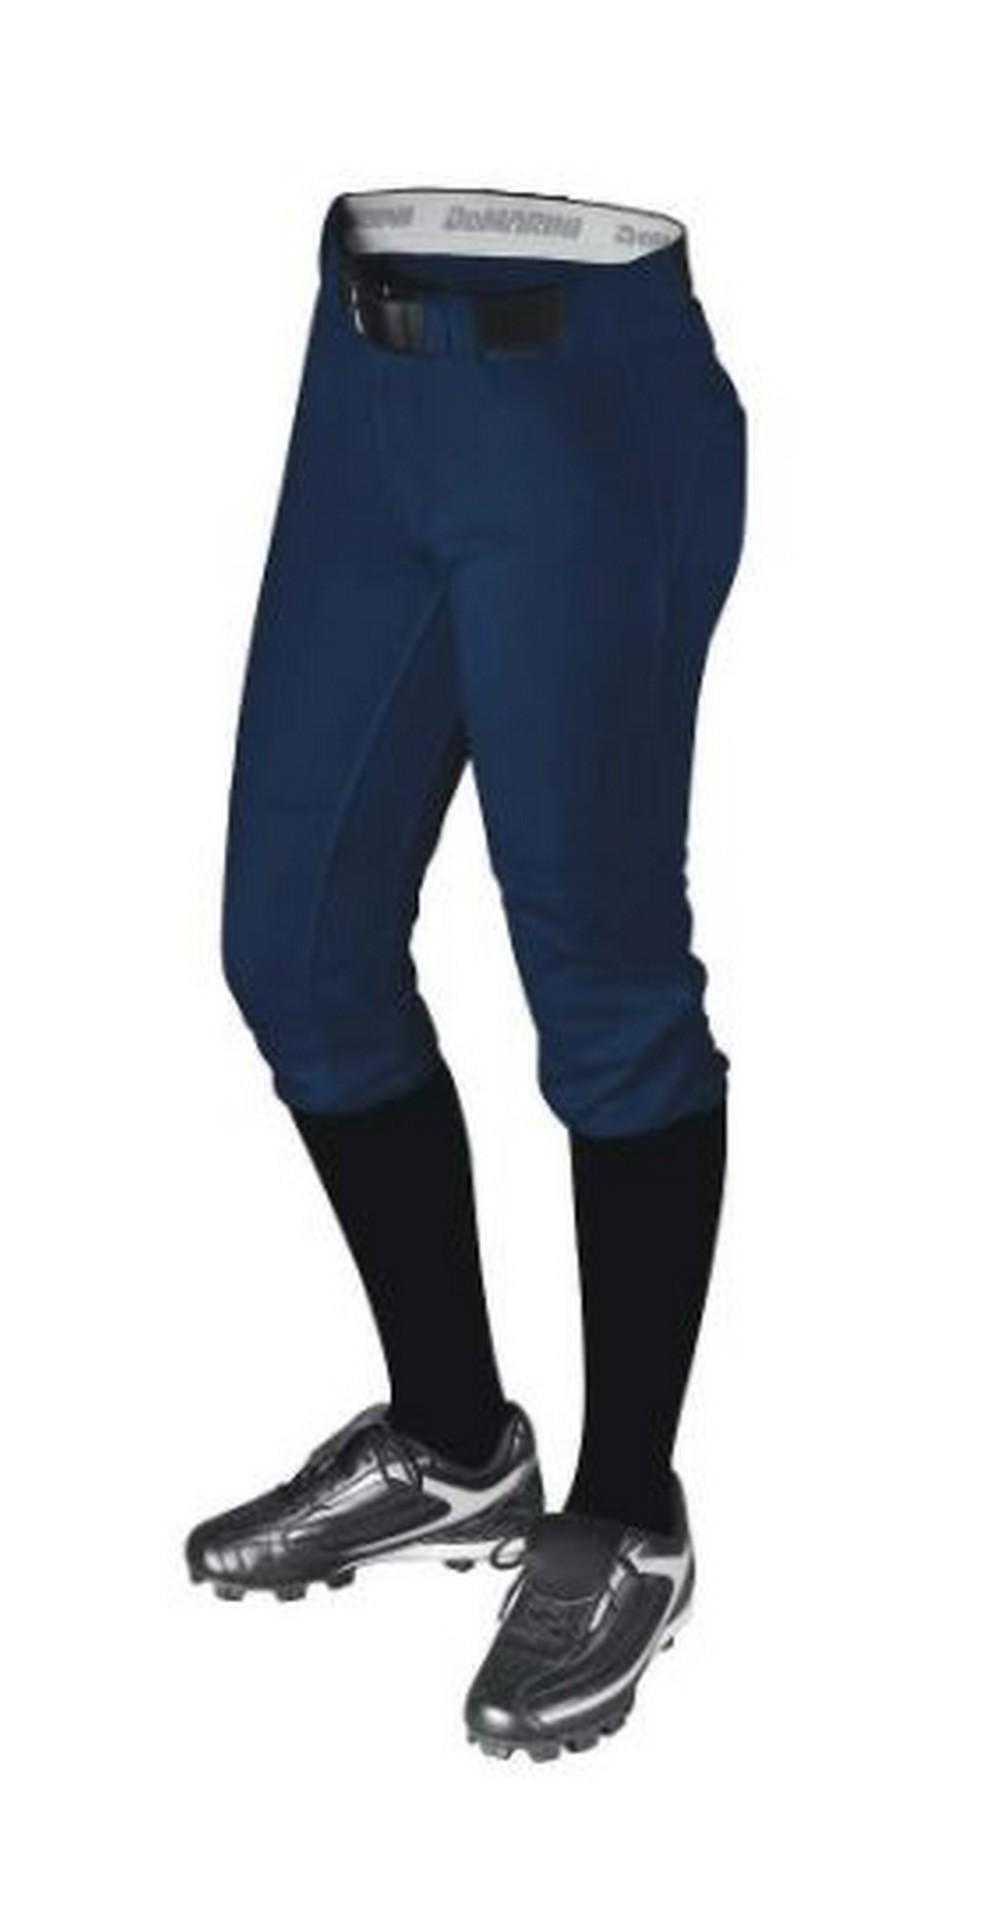 Demarini Uprising Fastpitch Softball Pants